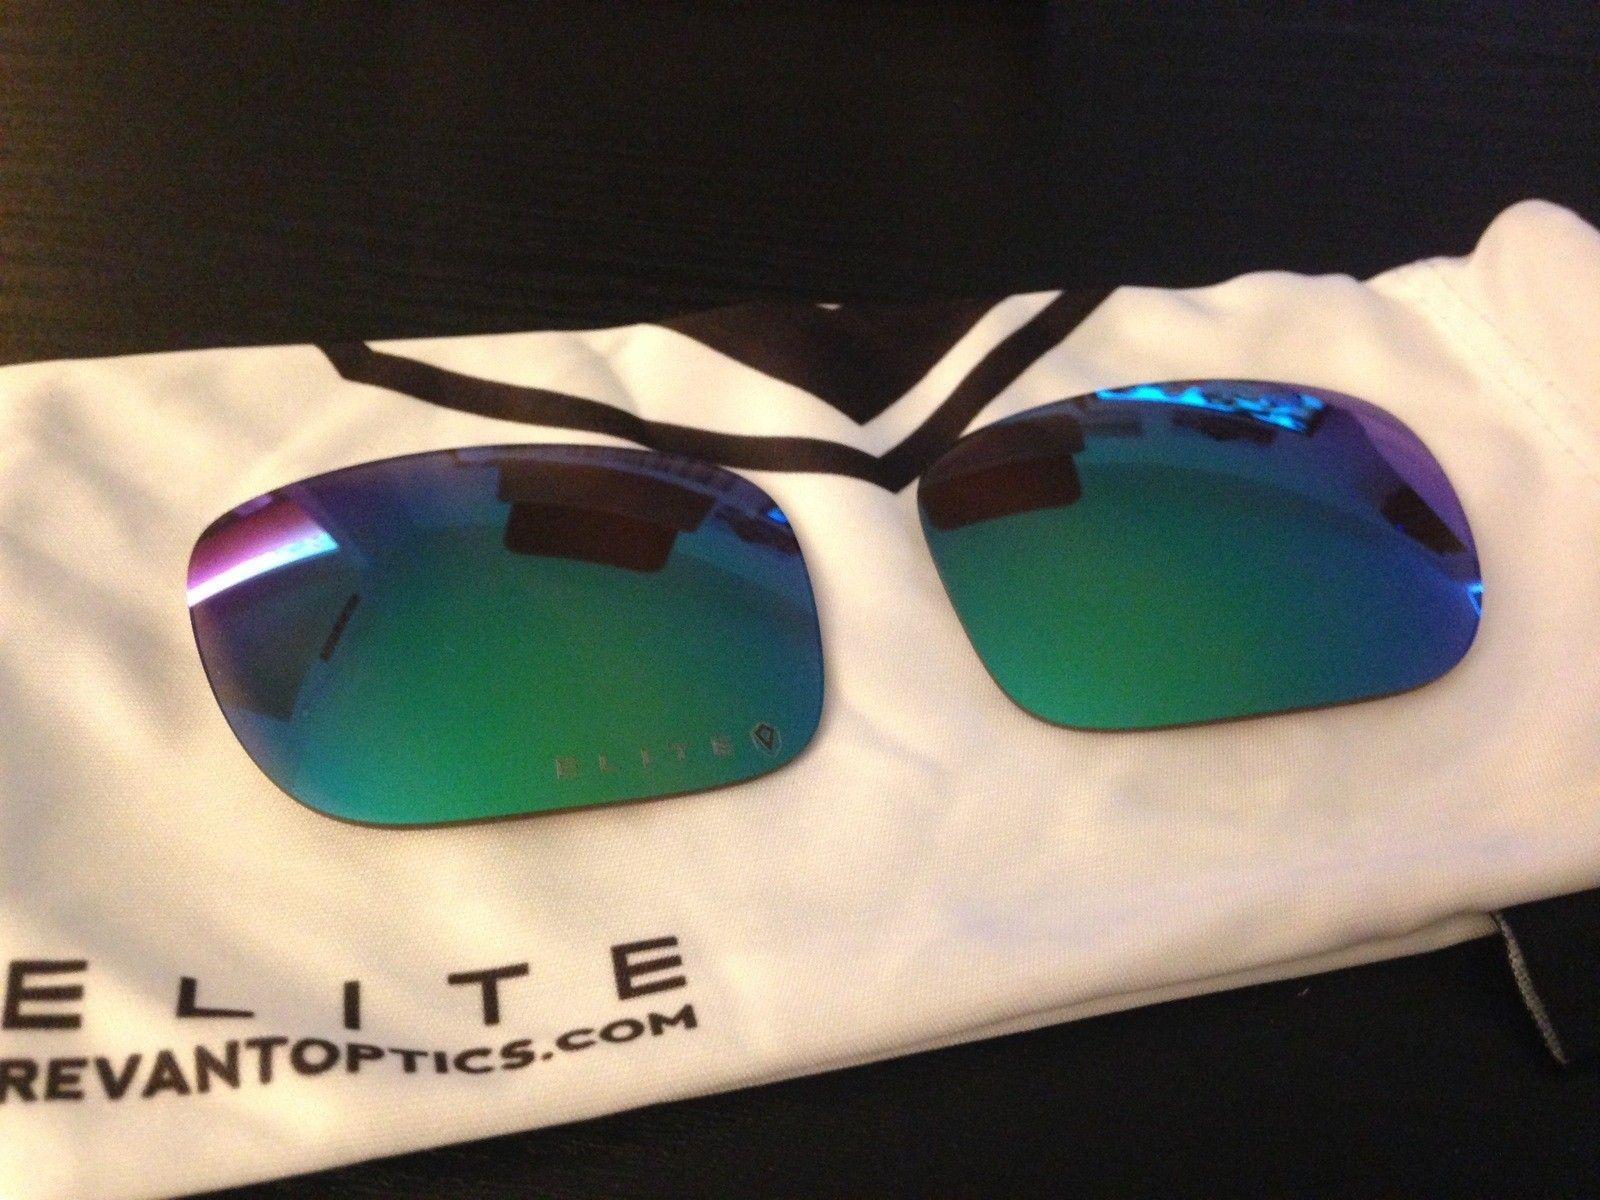 4d57d0fd4a5f0 Revant Optics HC3 Elite Mirrorshield Lens Review